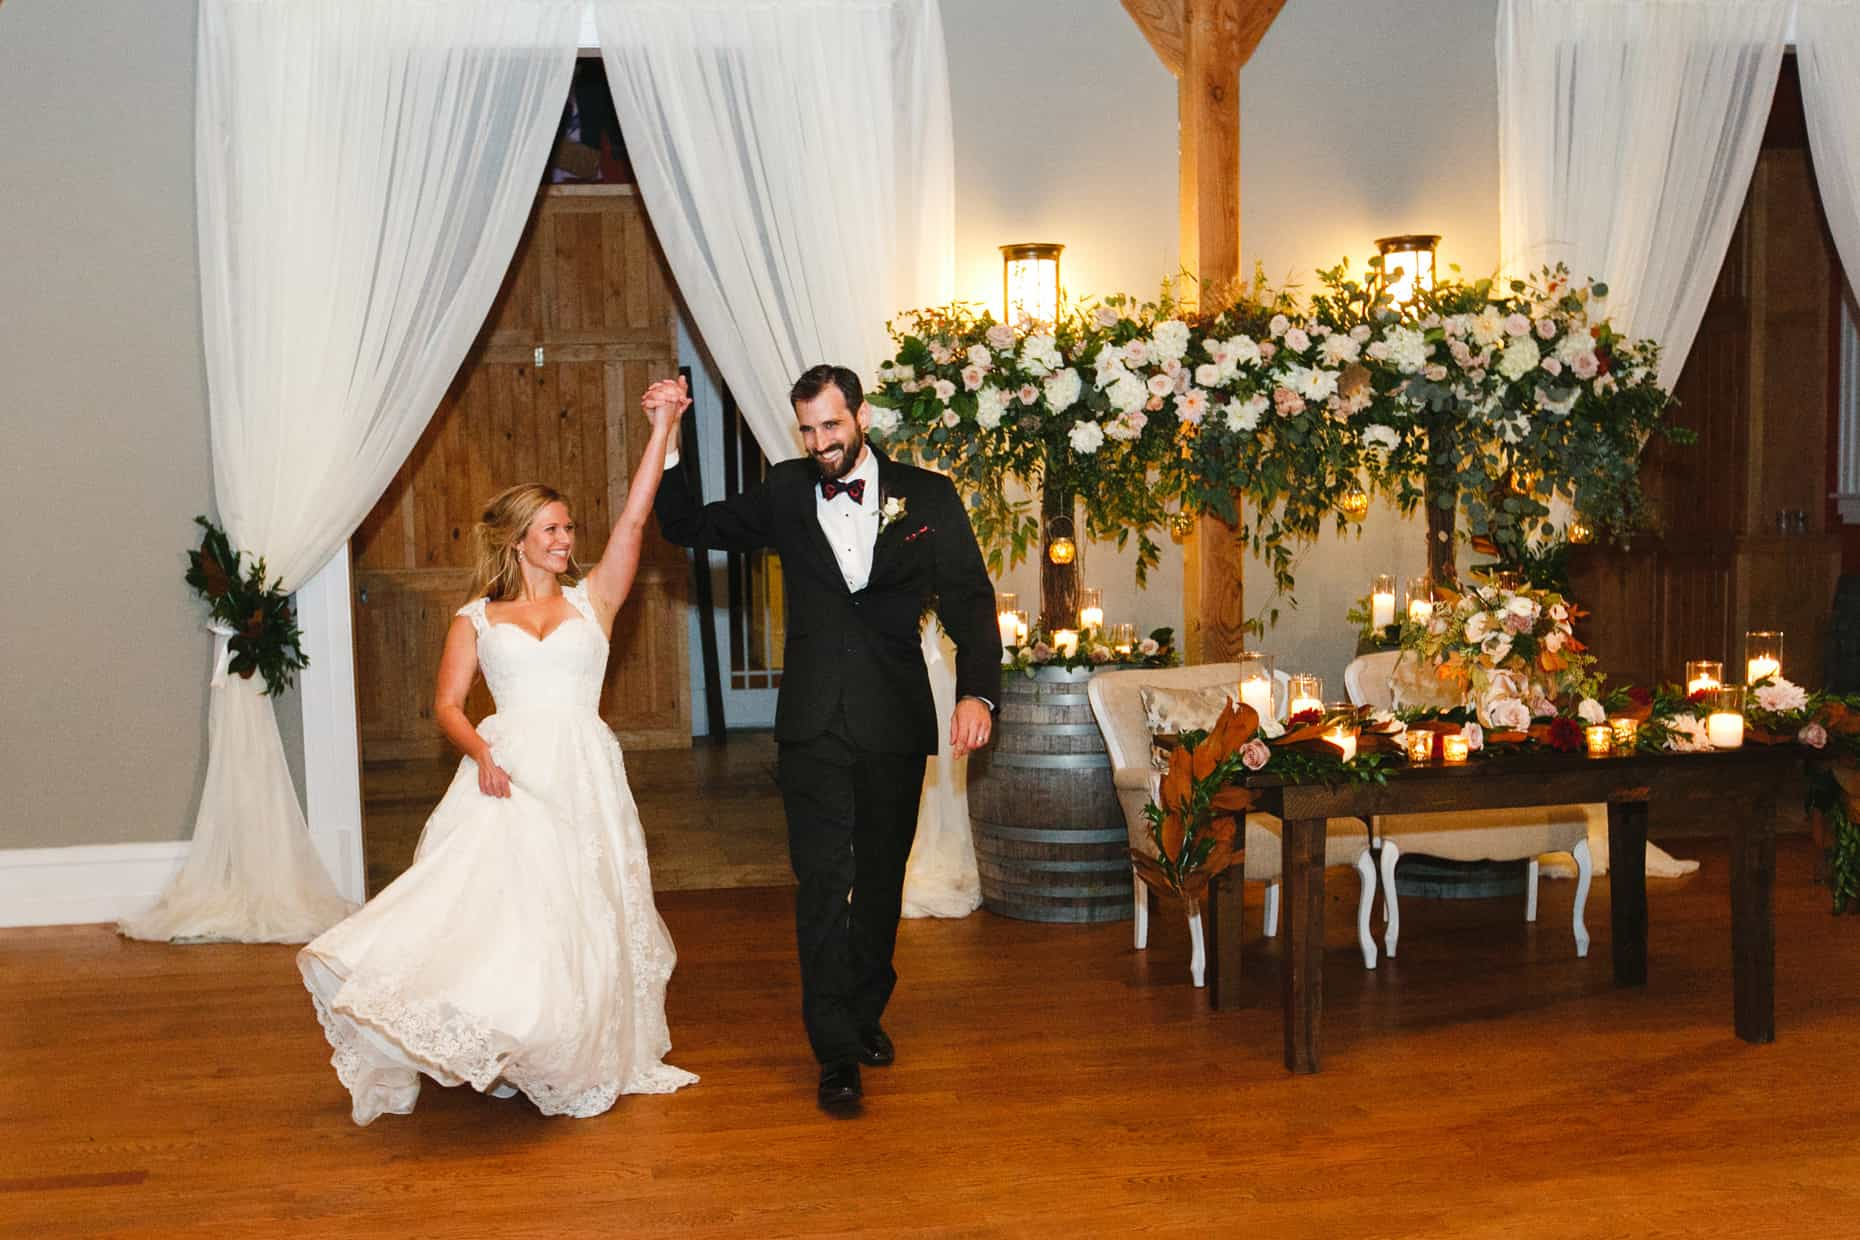 Wedding Photographs New Jersey